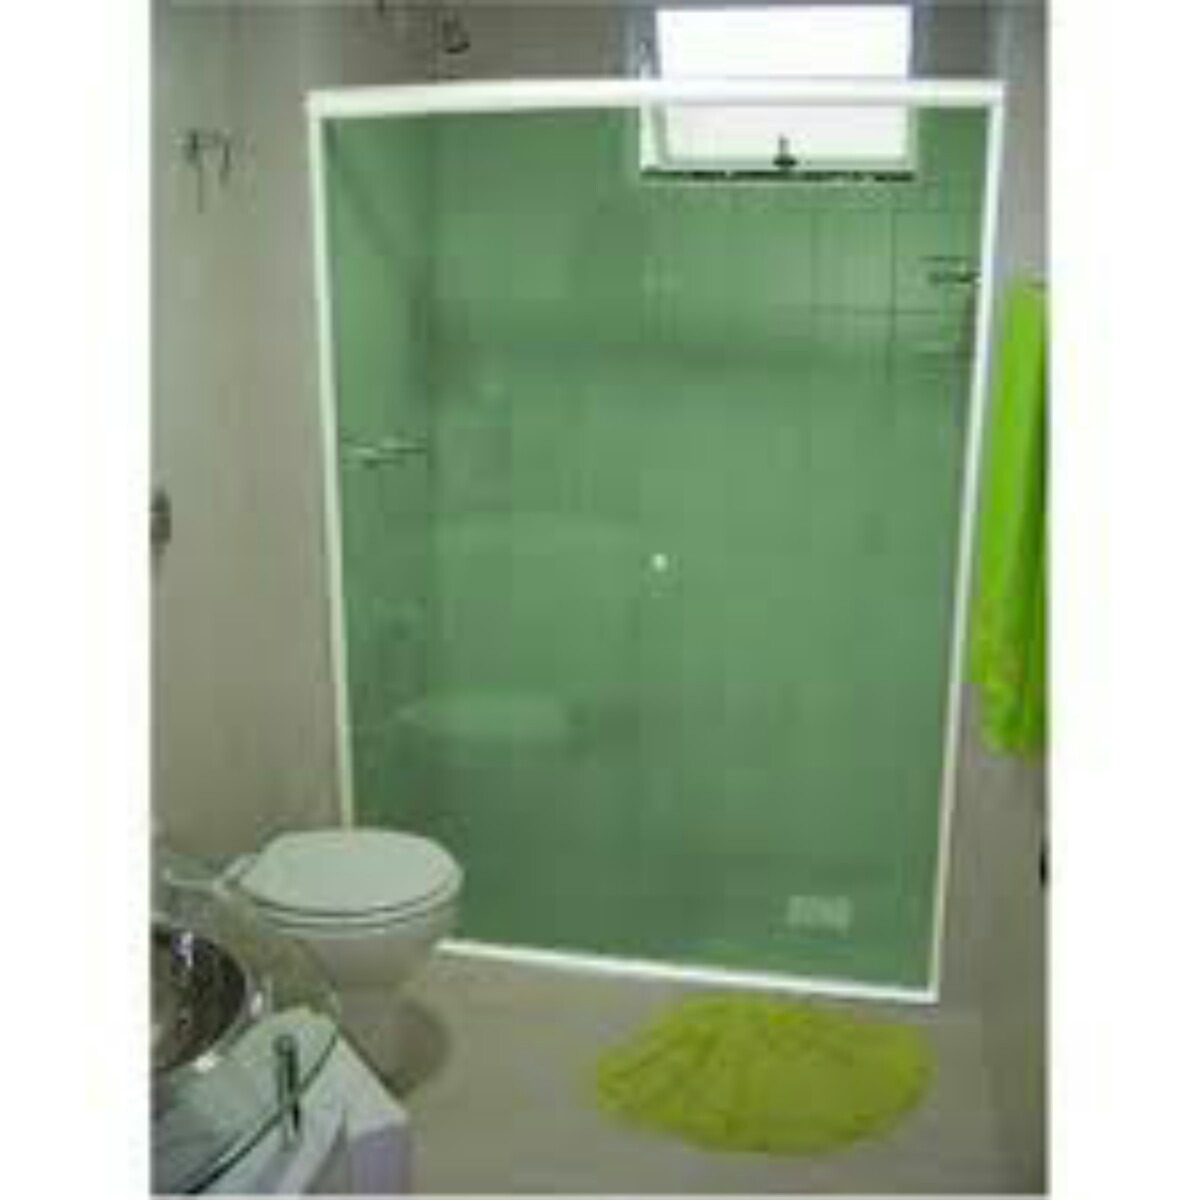 box vidro tipo blindex r 59 00 em mercado livre. Black Bedroom Furniture Sets. Home Design Ideas